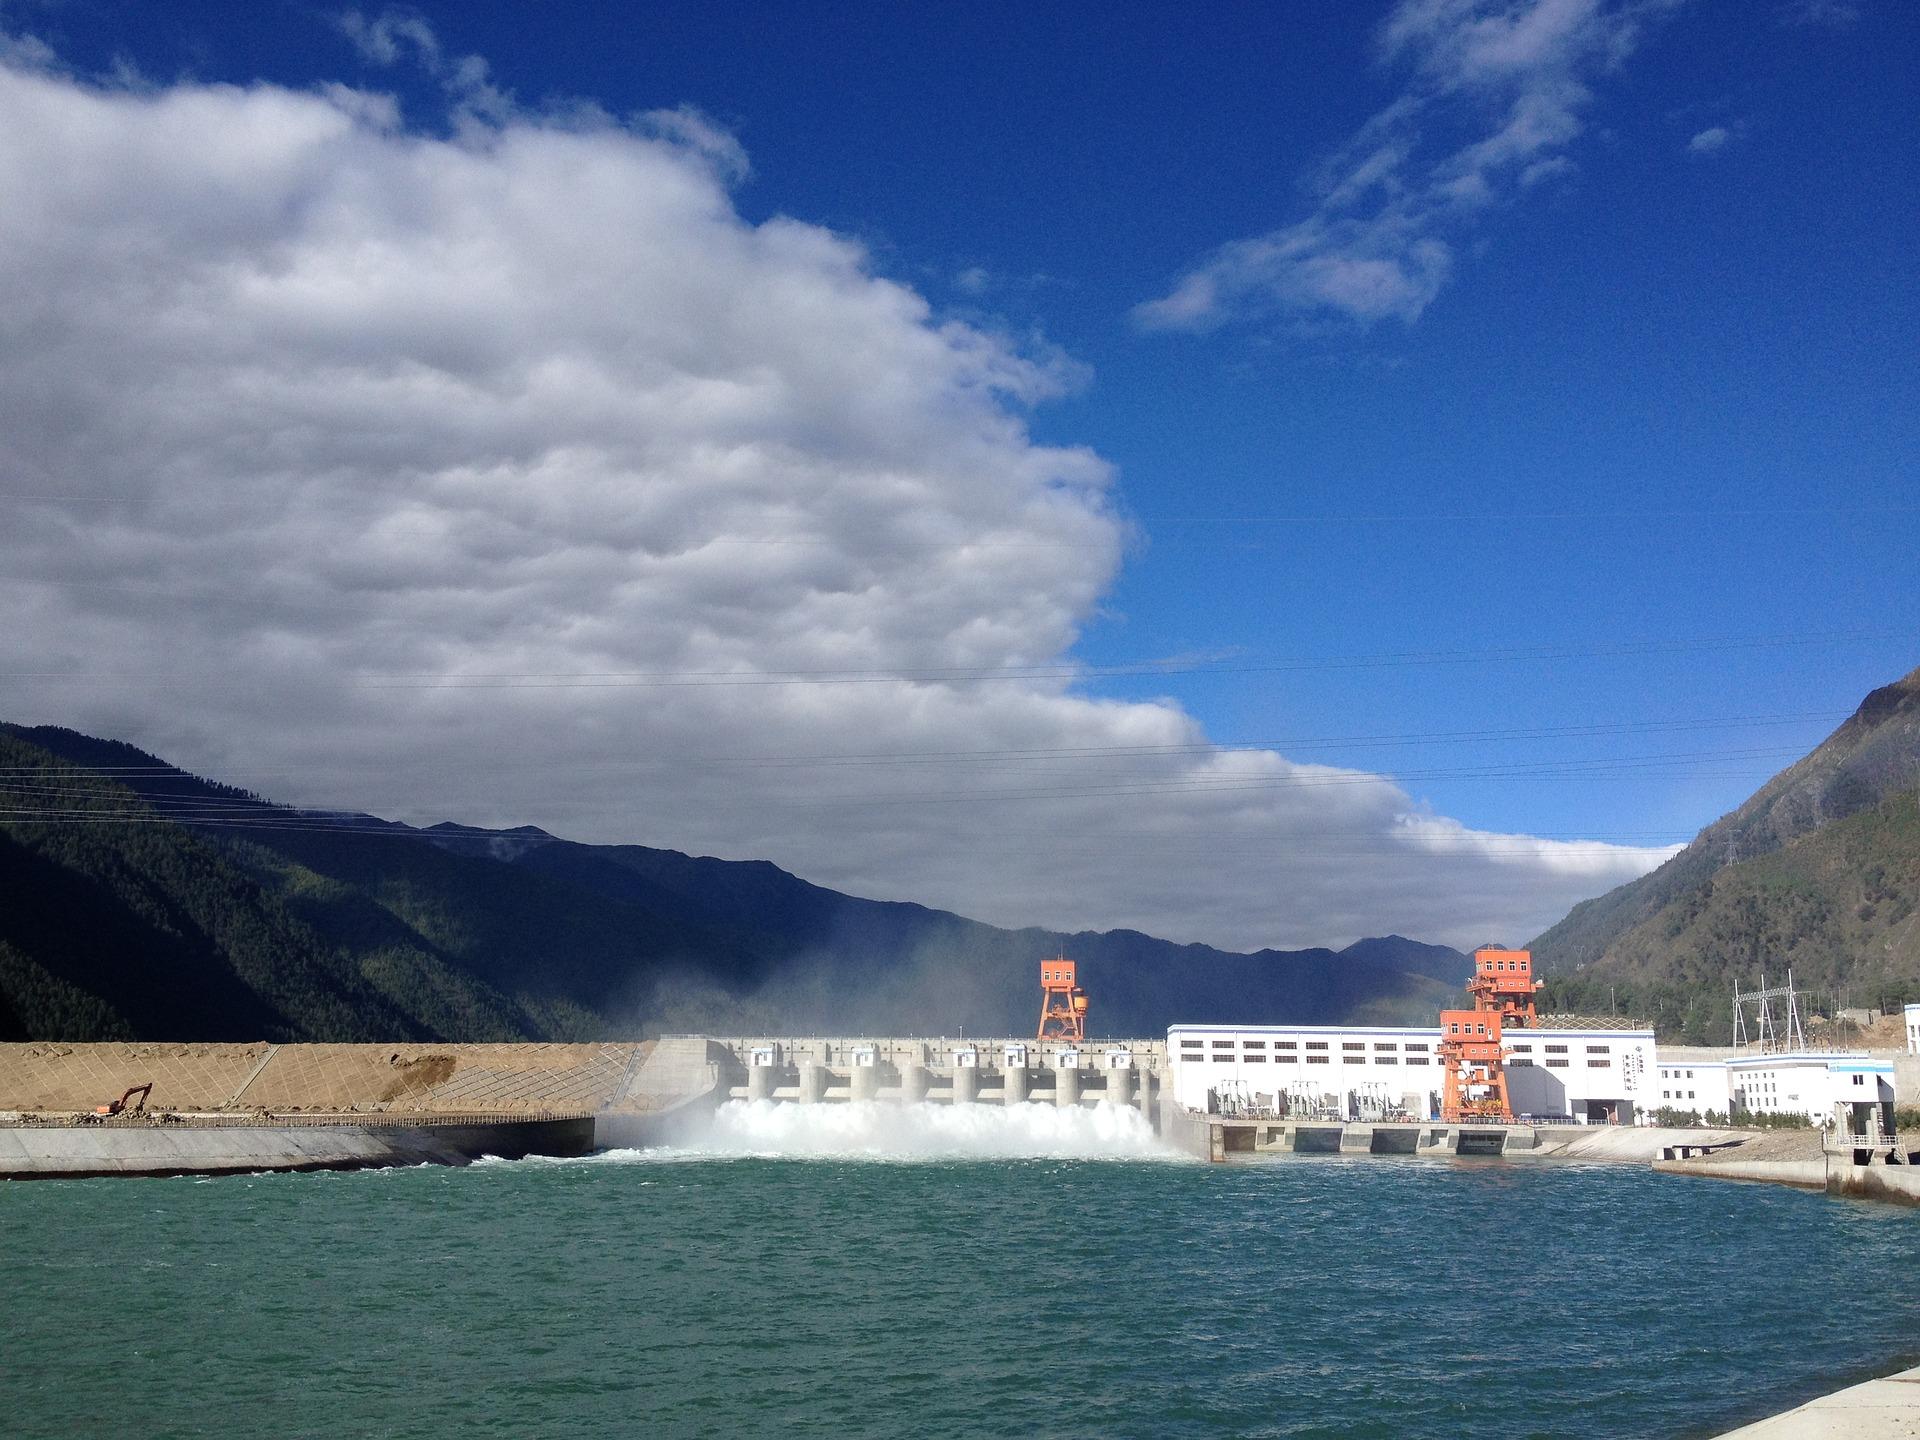 Г.3.3 Эксплуатация гидроэлектростанций